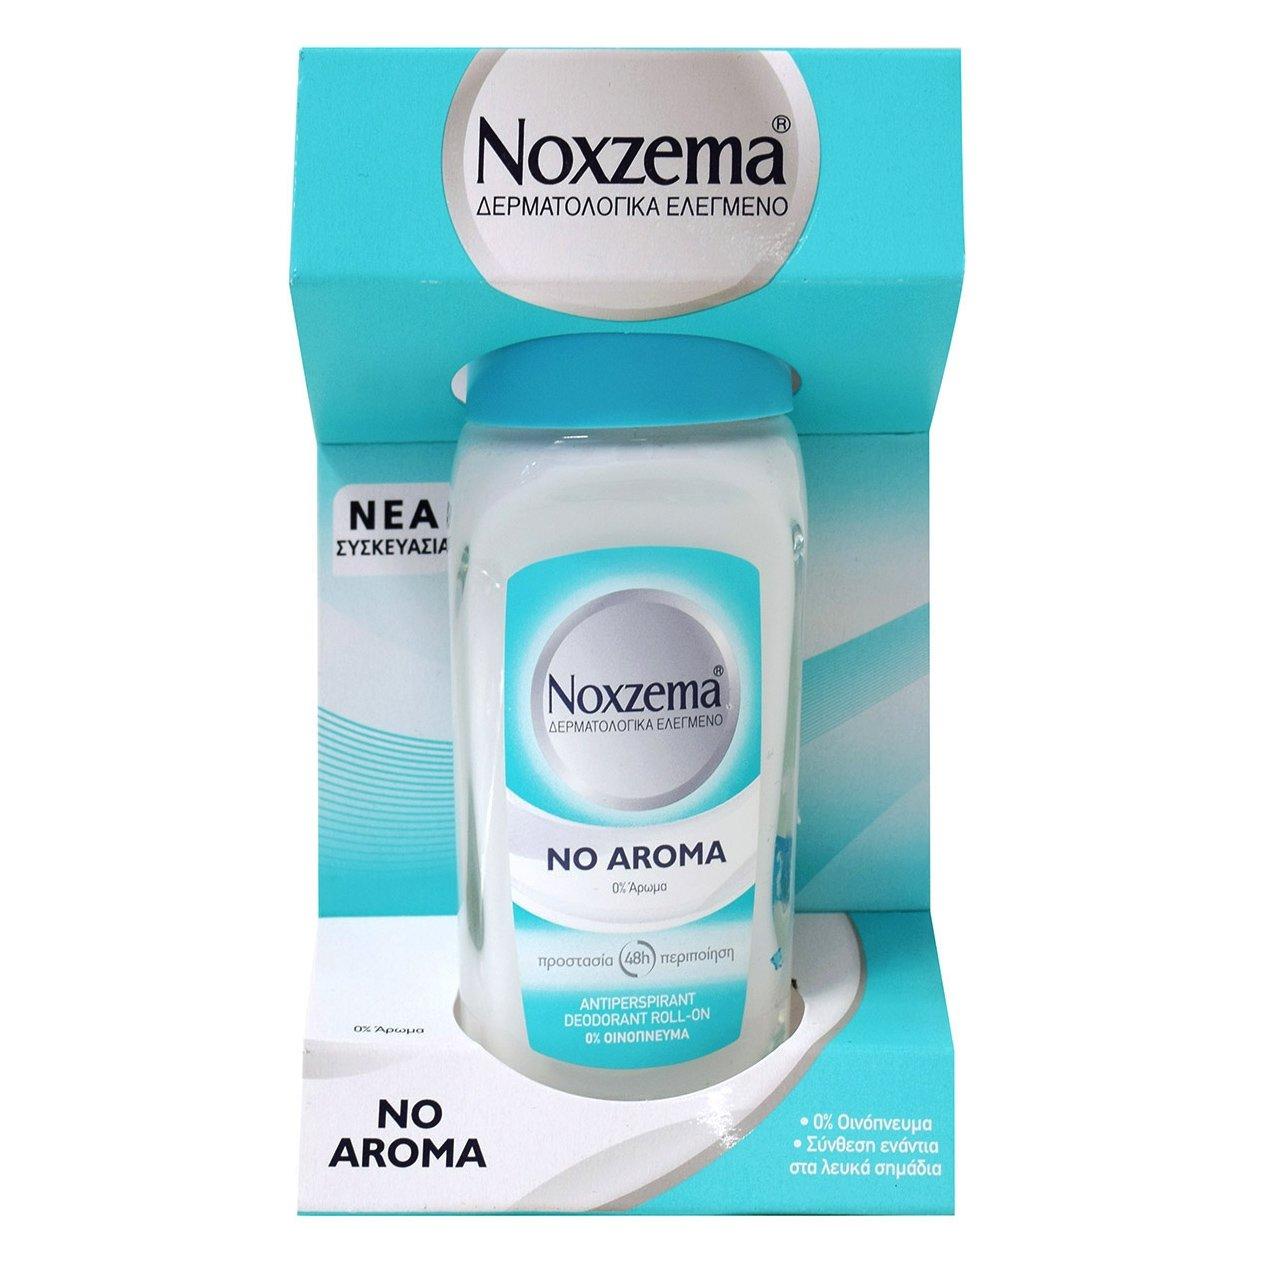 Noxzema No Aroma Αποσμητικό Υποαλλεργικό Χωρίς Άρωμα 50ml